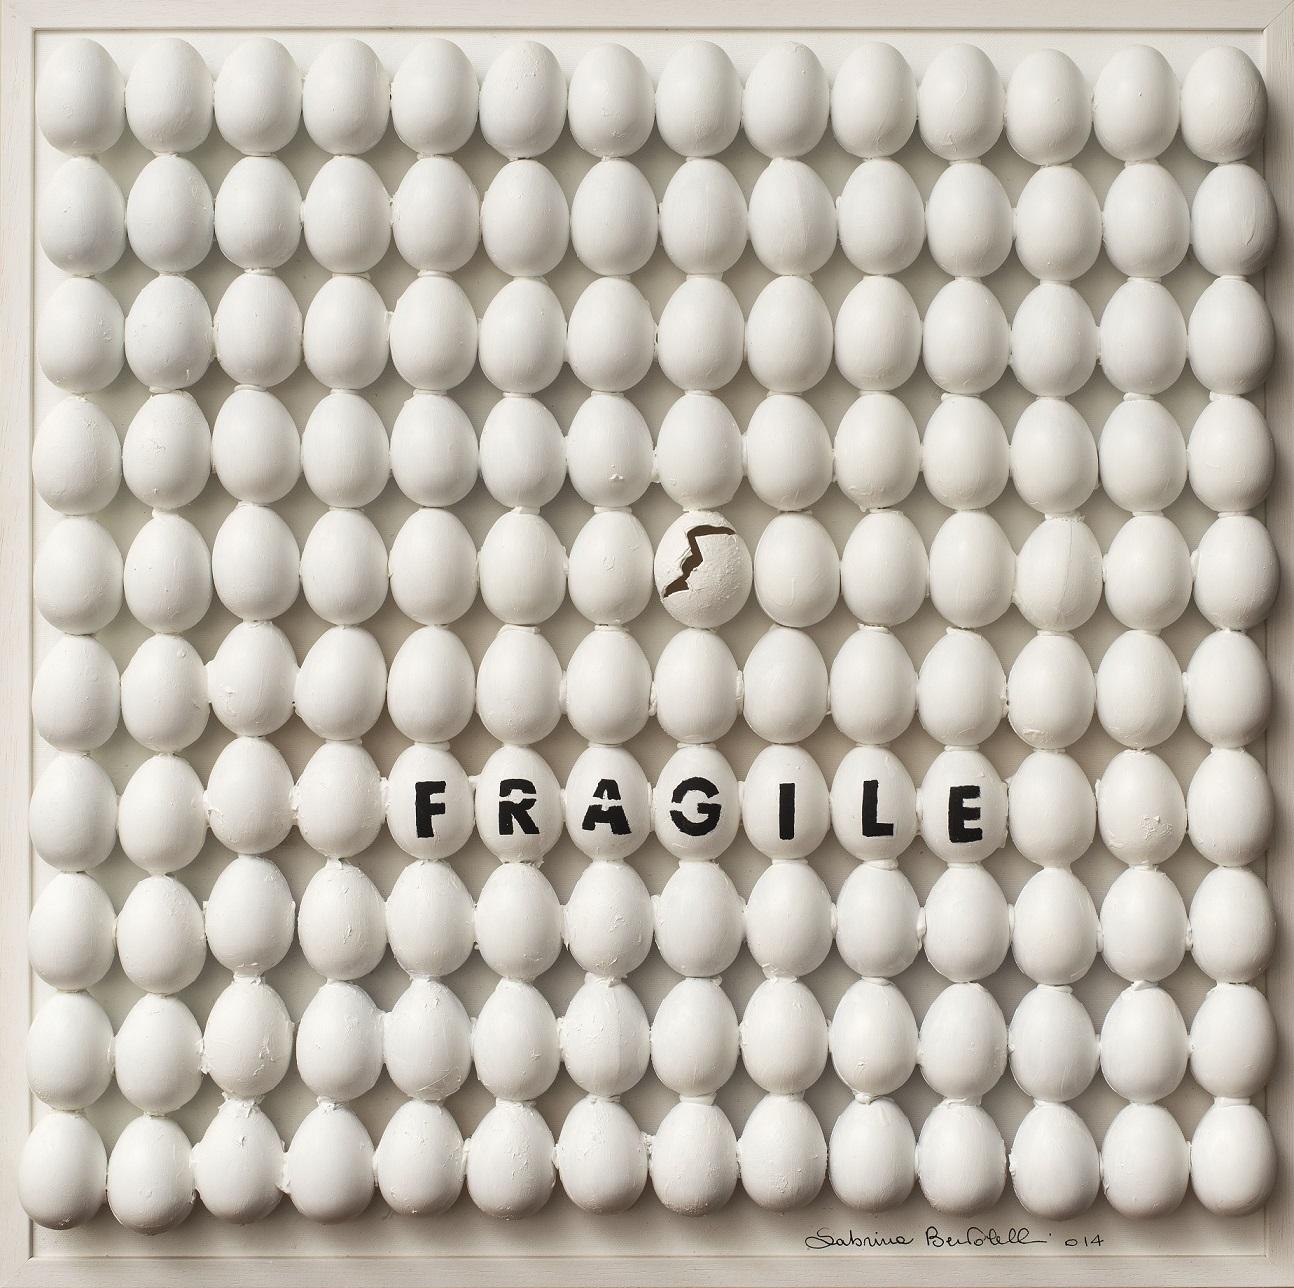 Sabrina Bertolelli, Uova fragile, tecnica mista su tela, 60x60cm, 2014